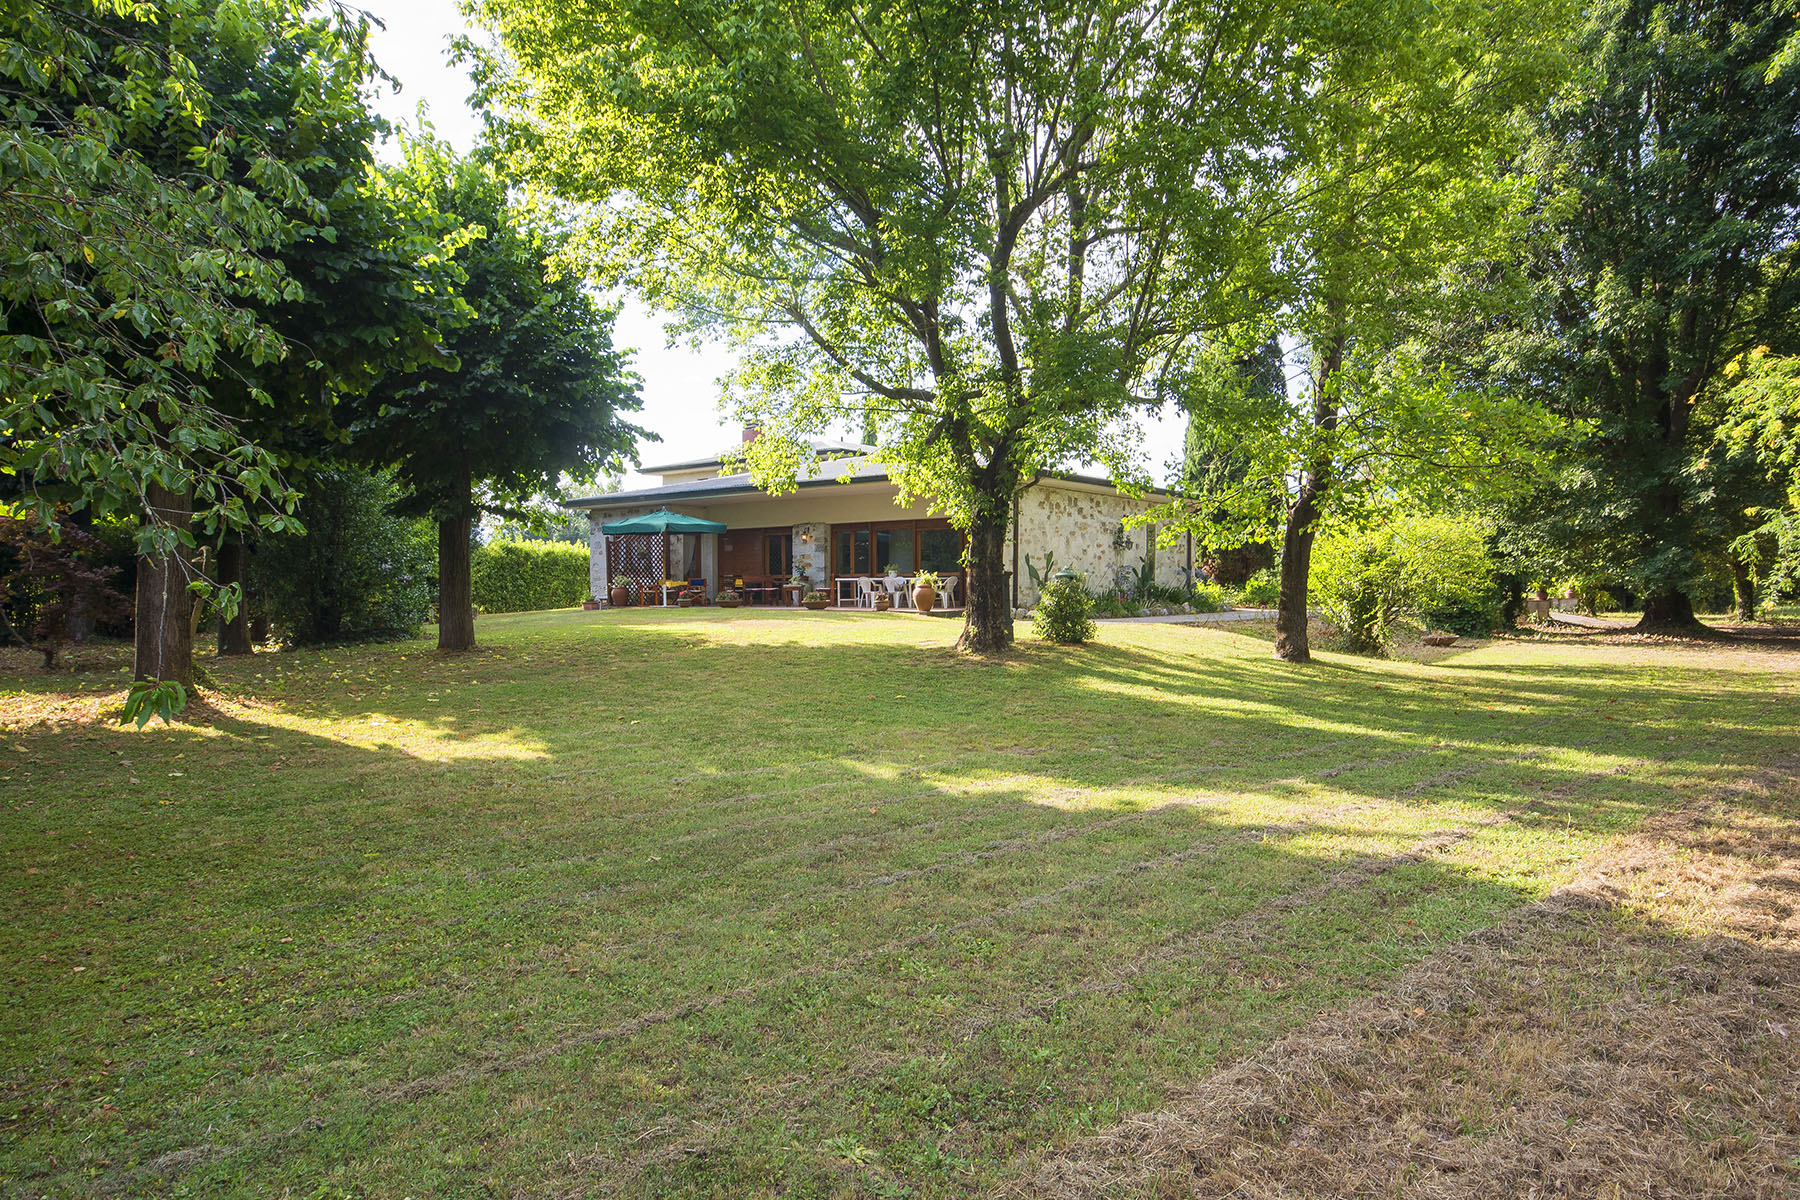 Villa in Vendita a Capannori: 5 locali, 500 mq - Foto 14